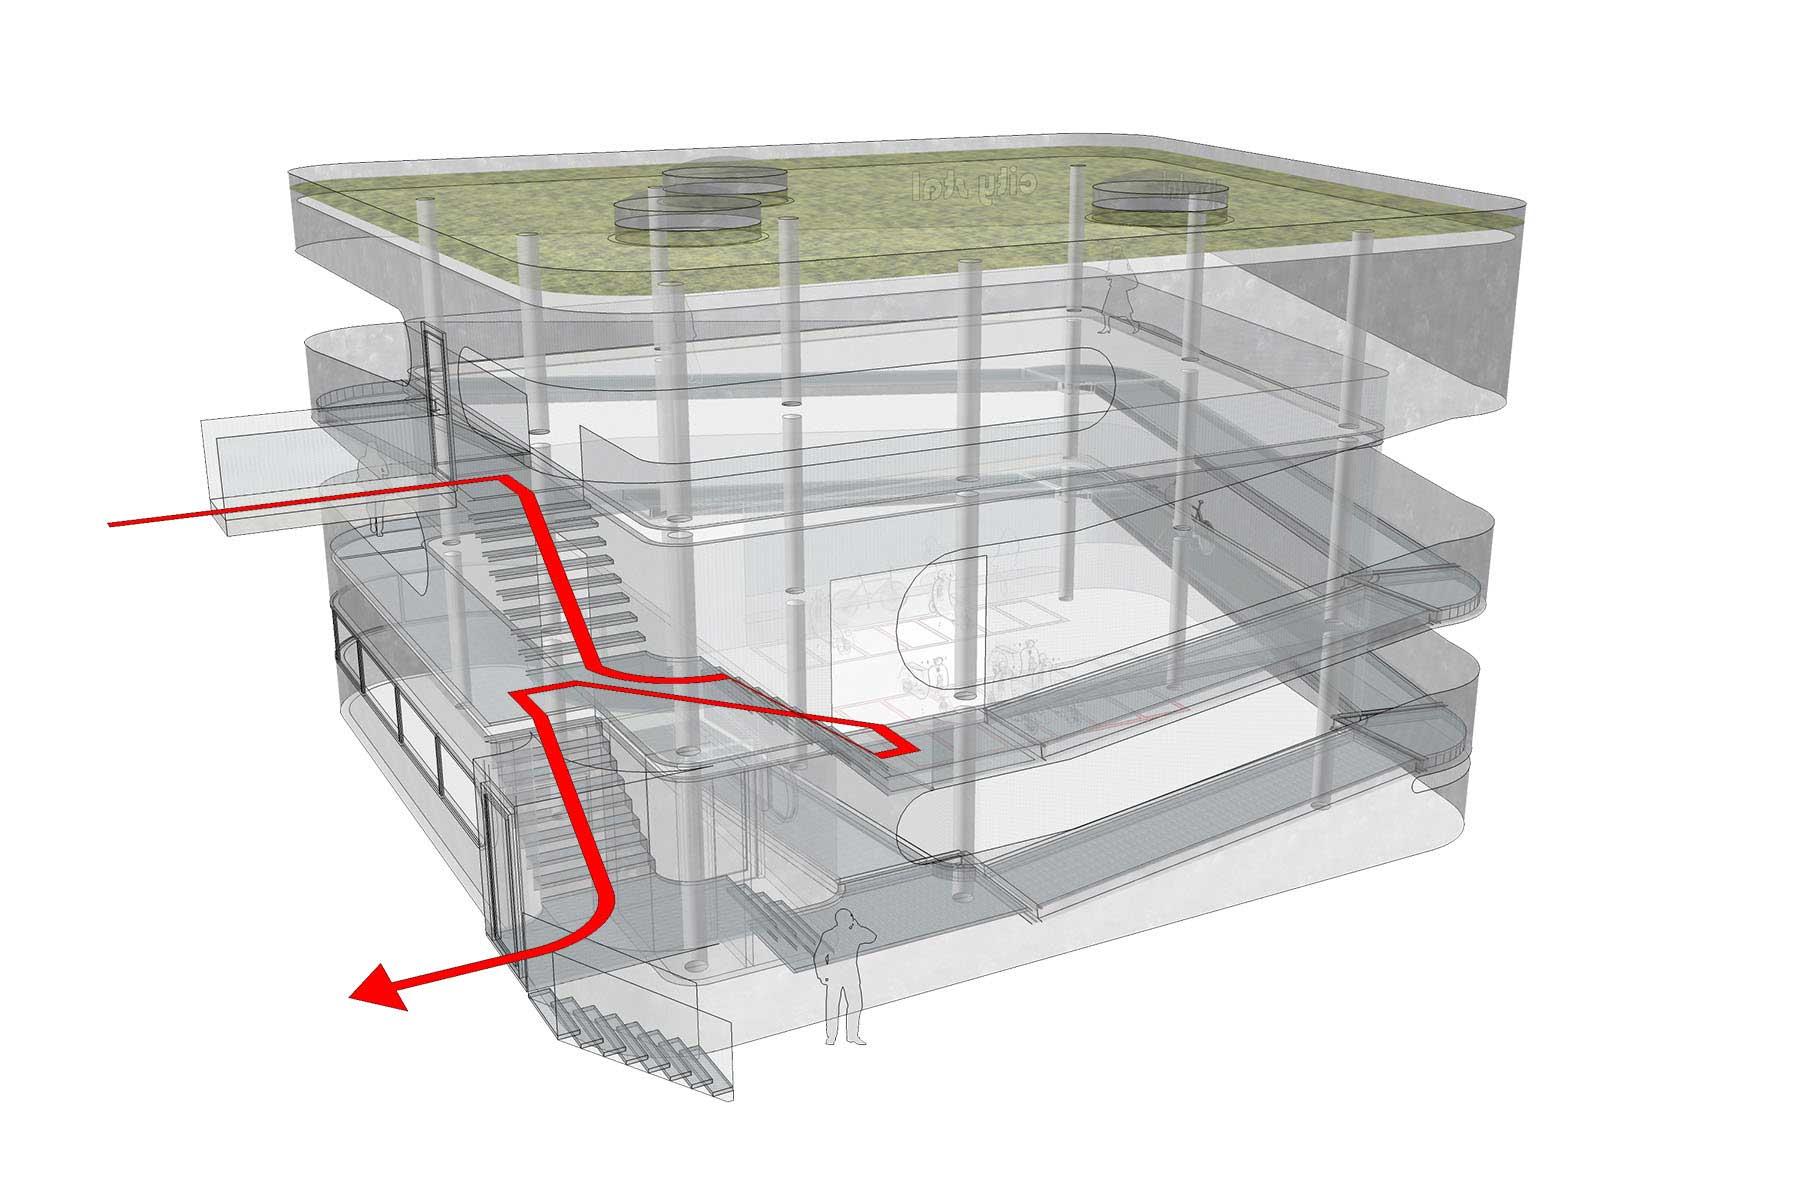 8A-Architecten-city-stal-nieuwegein-06